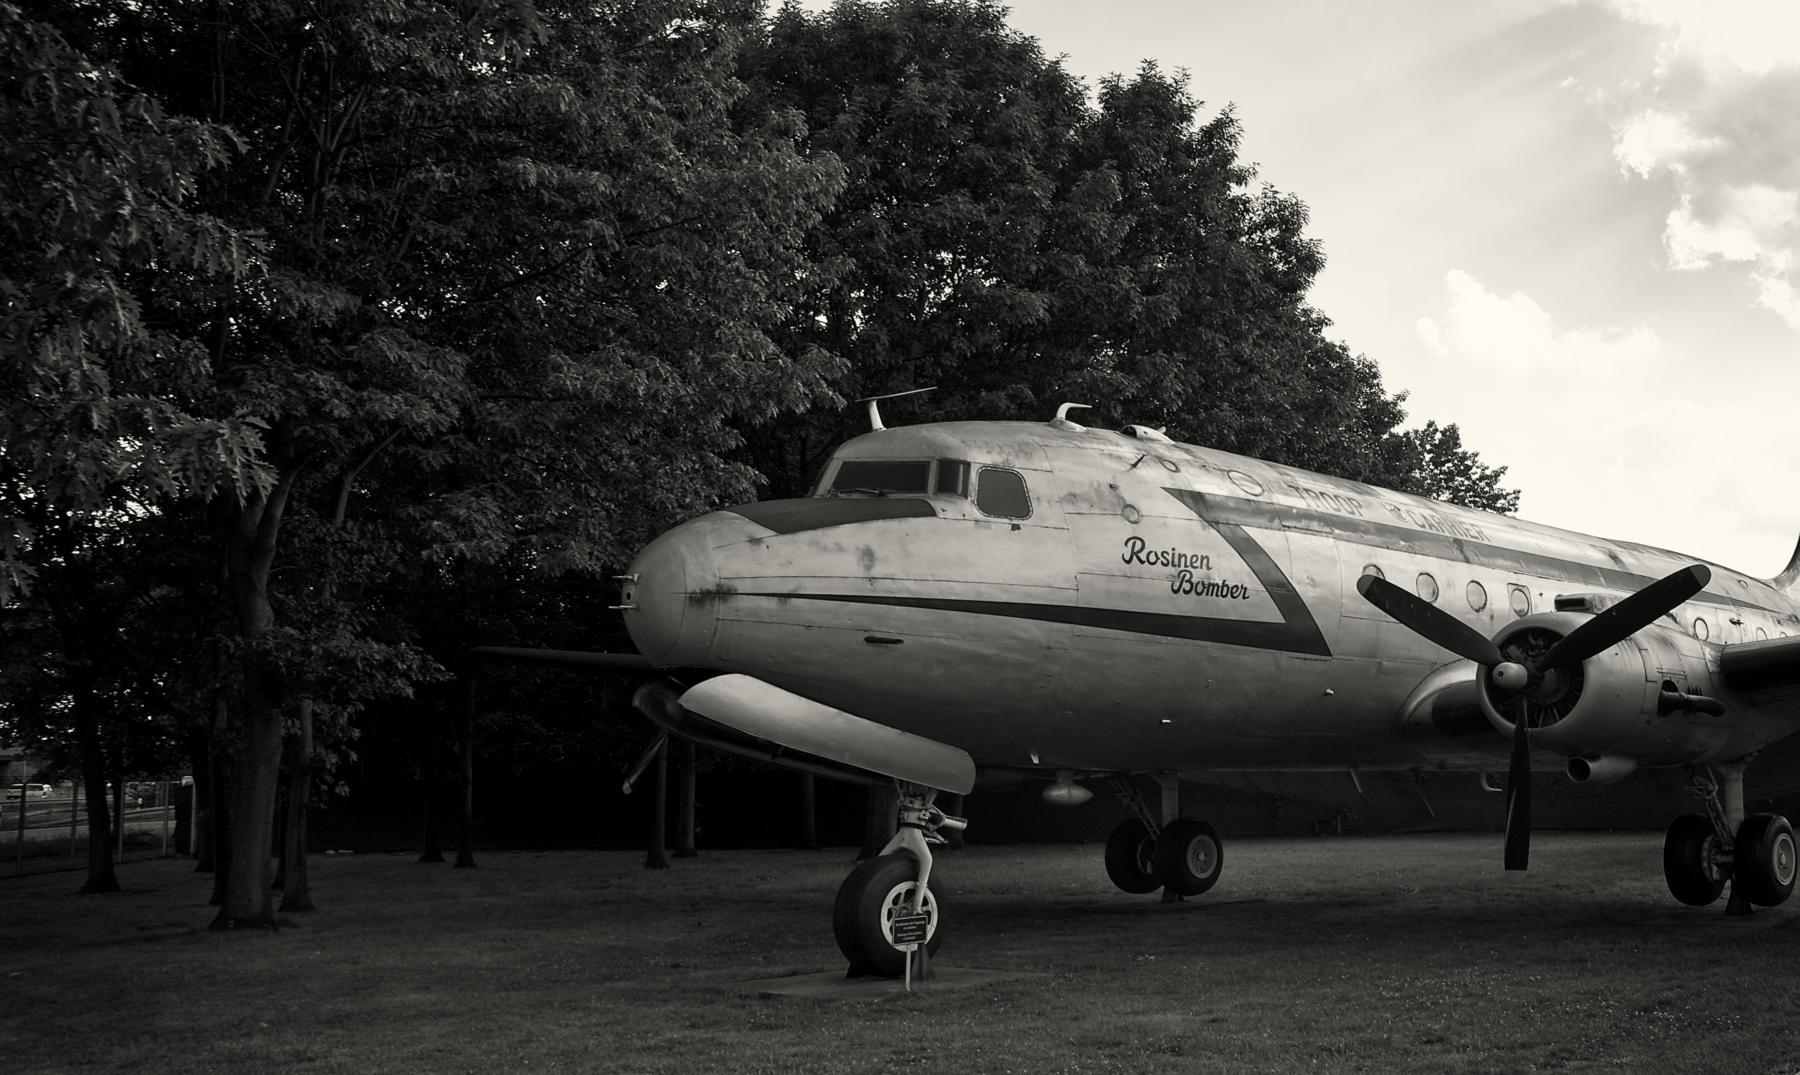 Los aviadores que lanzaron caramelos sobre Berlín en lugar de bombas